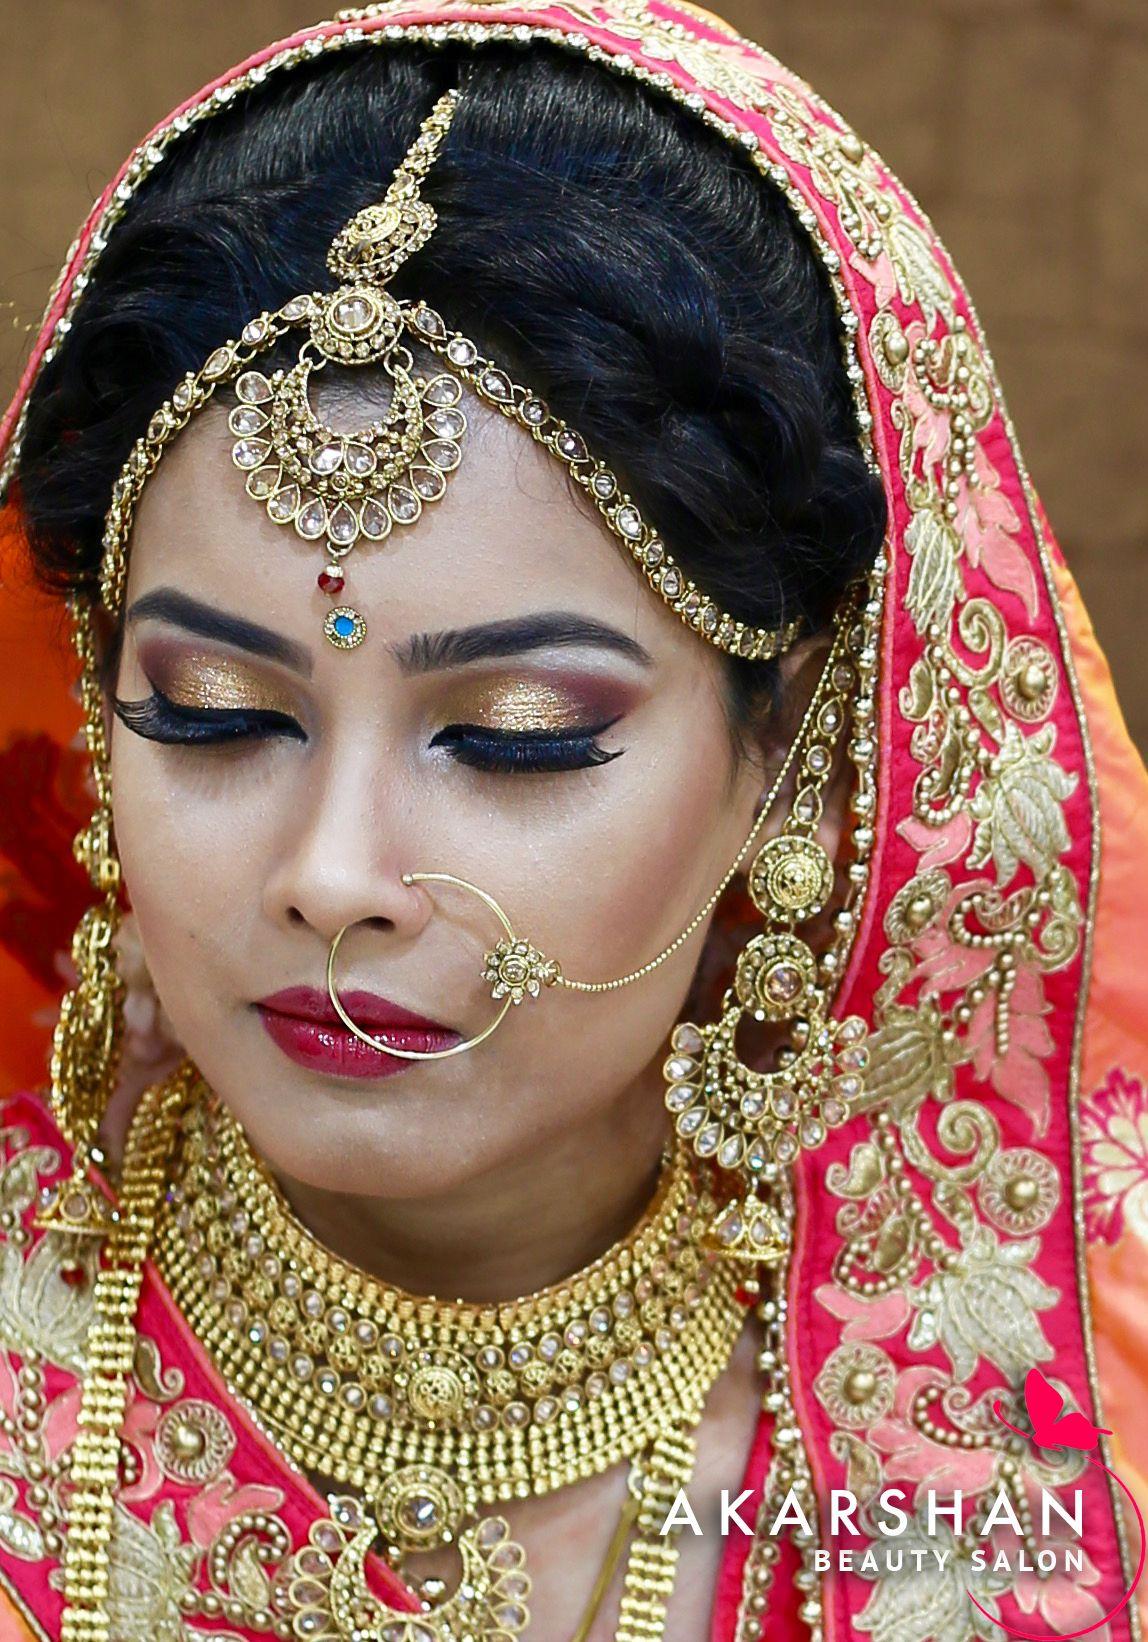 Pin On Akarshan Beauty Salon